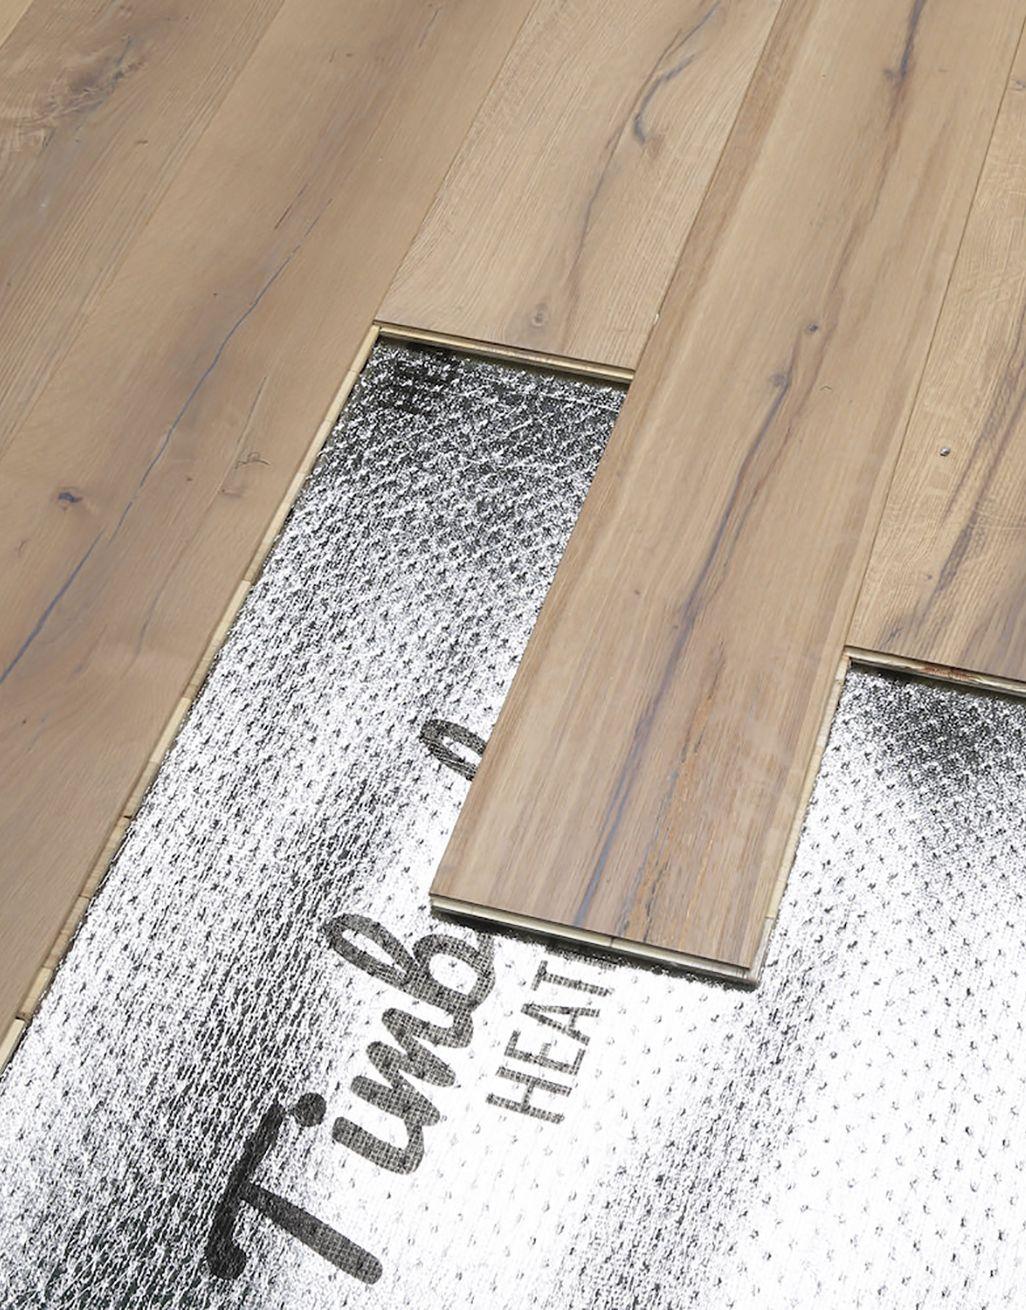 Timberlay Heatflow Underlay Direct, What Underlay For Laminate Flooring